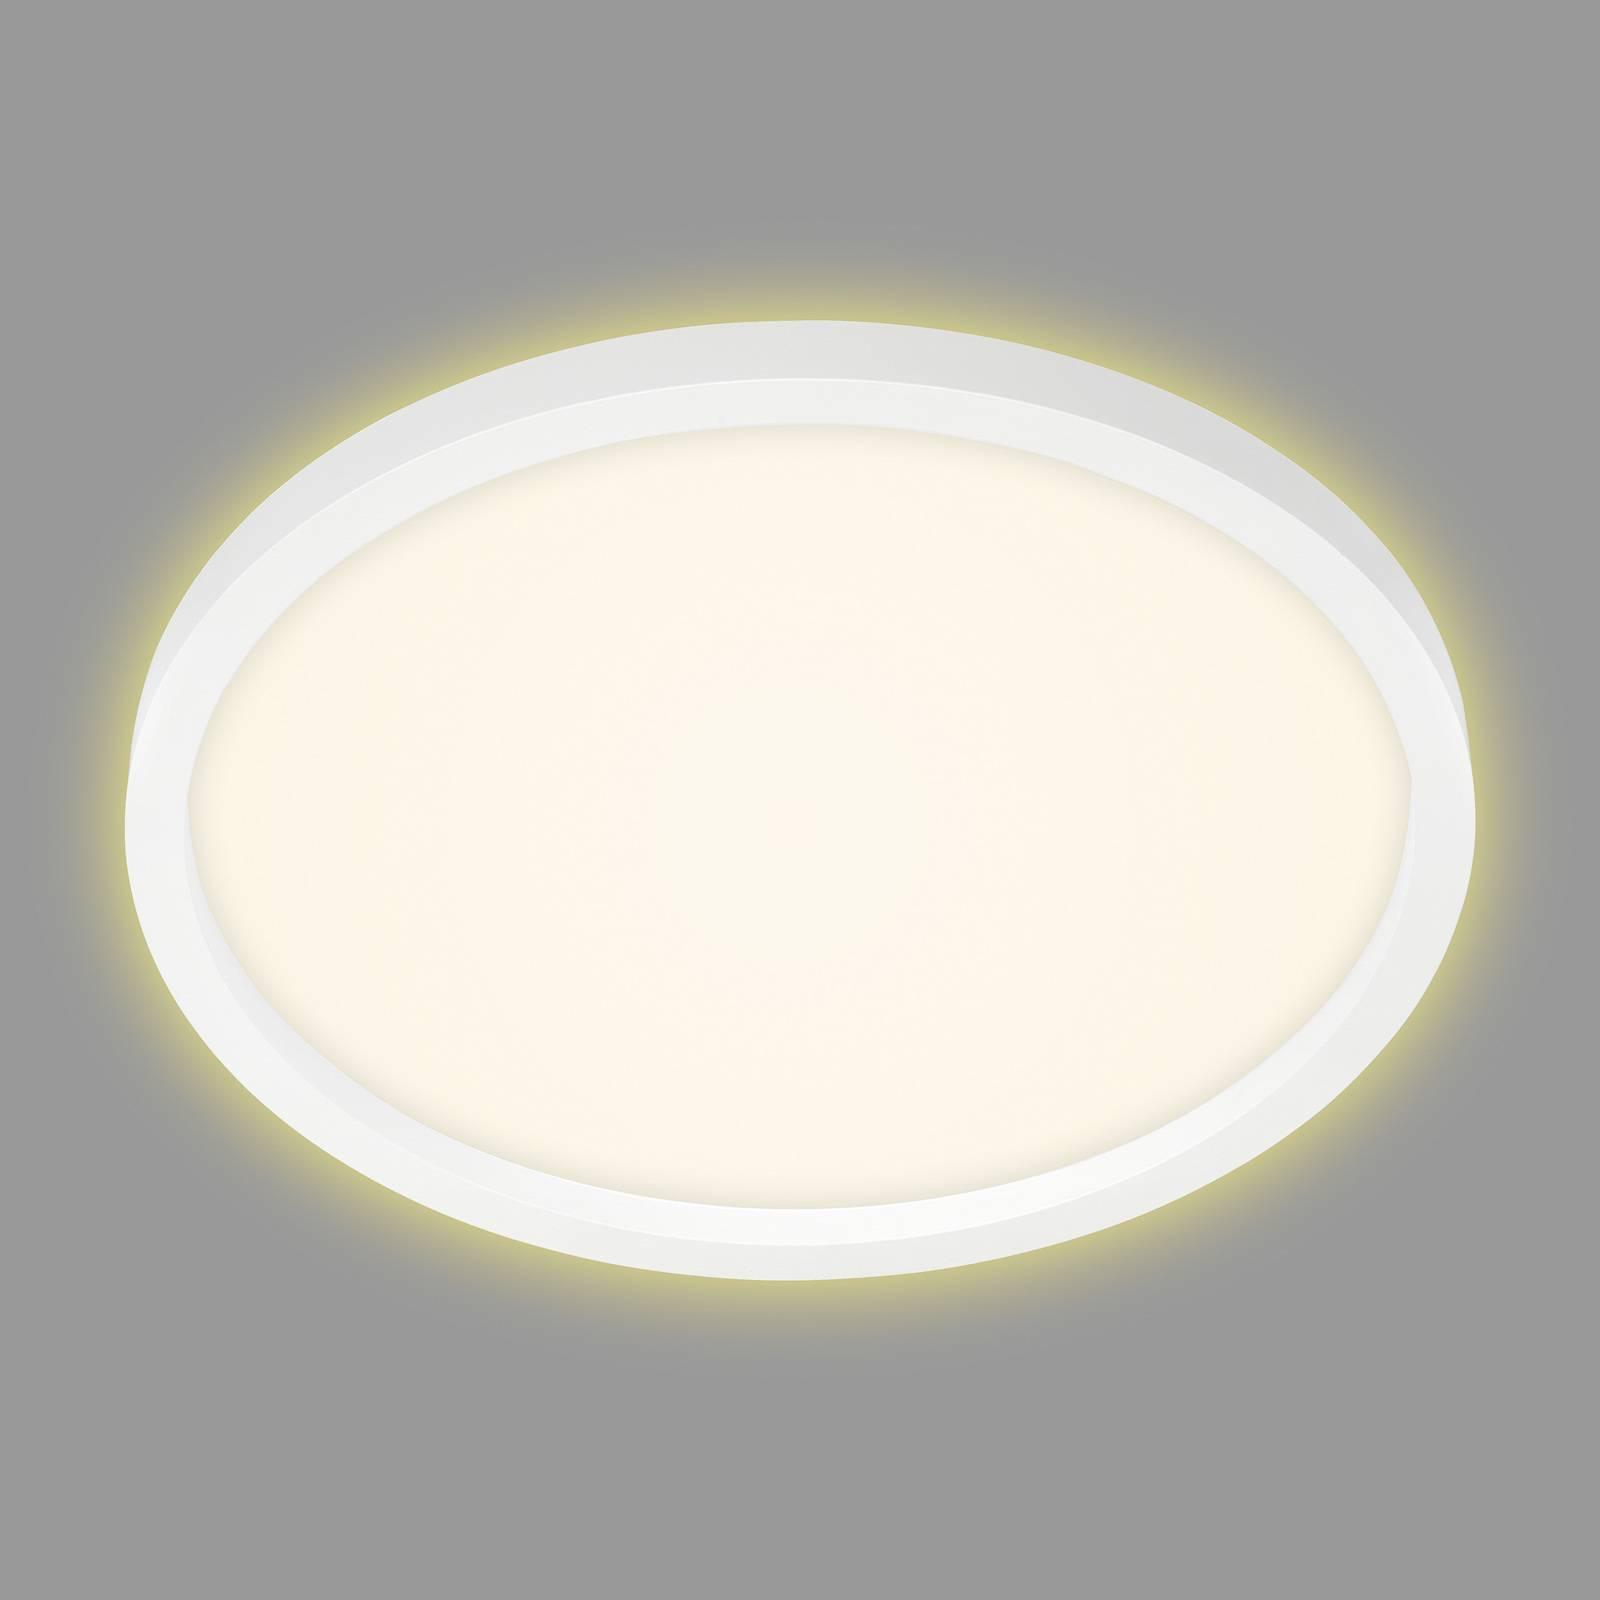 Lampa sufitowa LED 7363, Ø 42 cm, biała